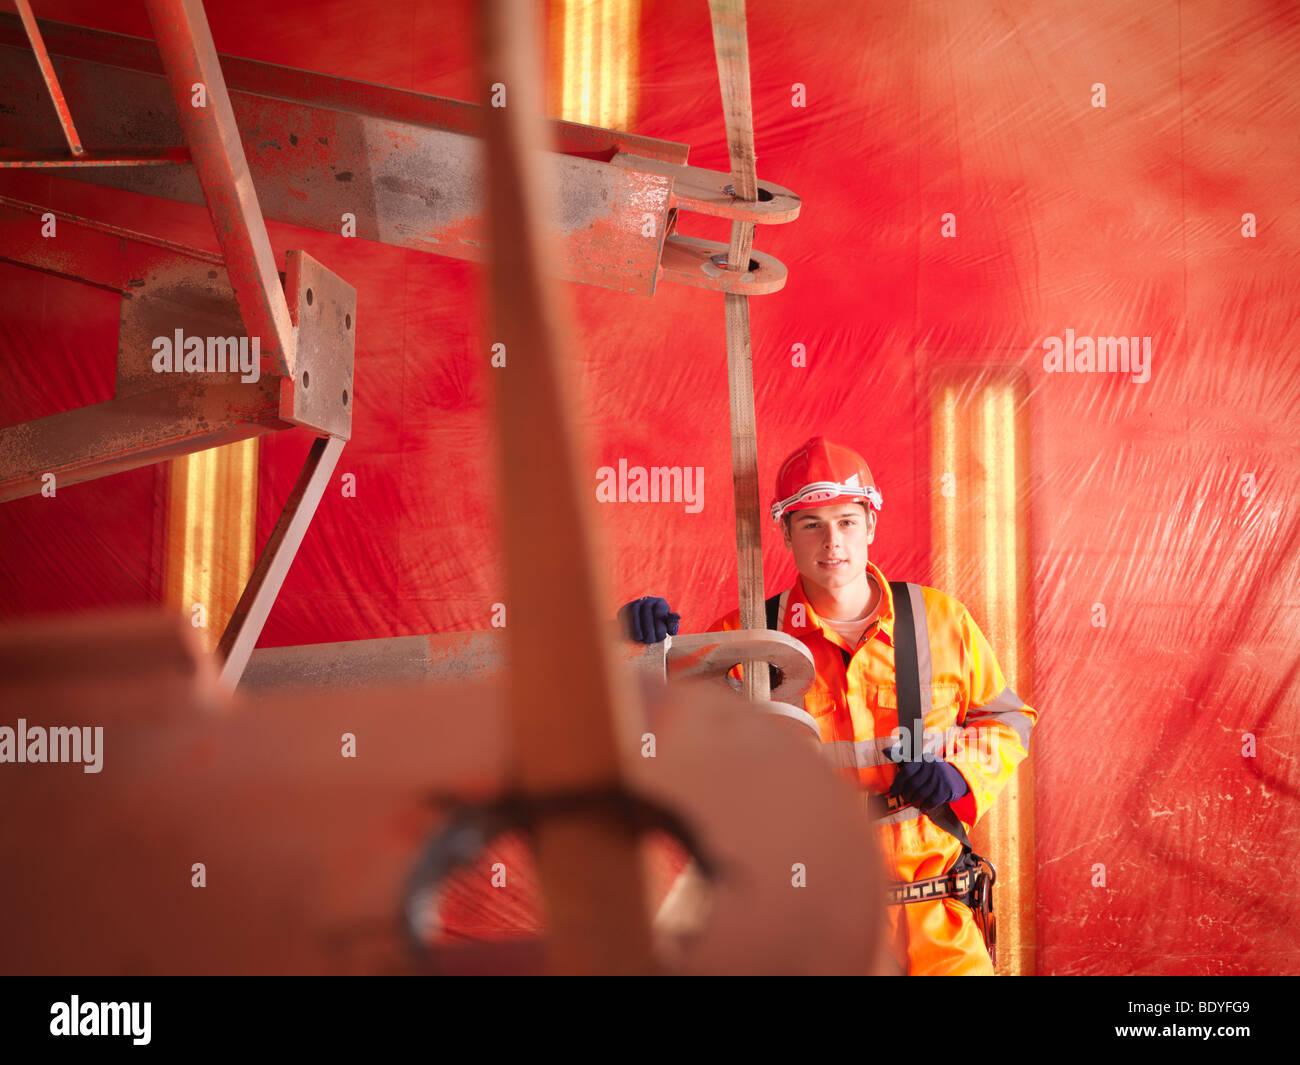 Crane Worker In Harness - Stock Image